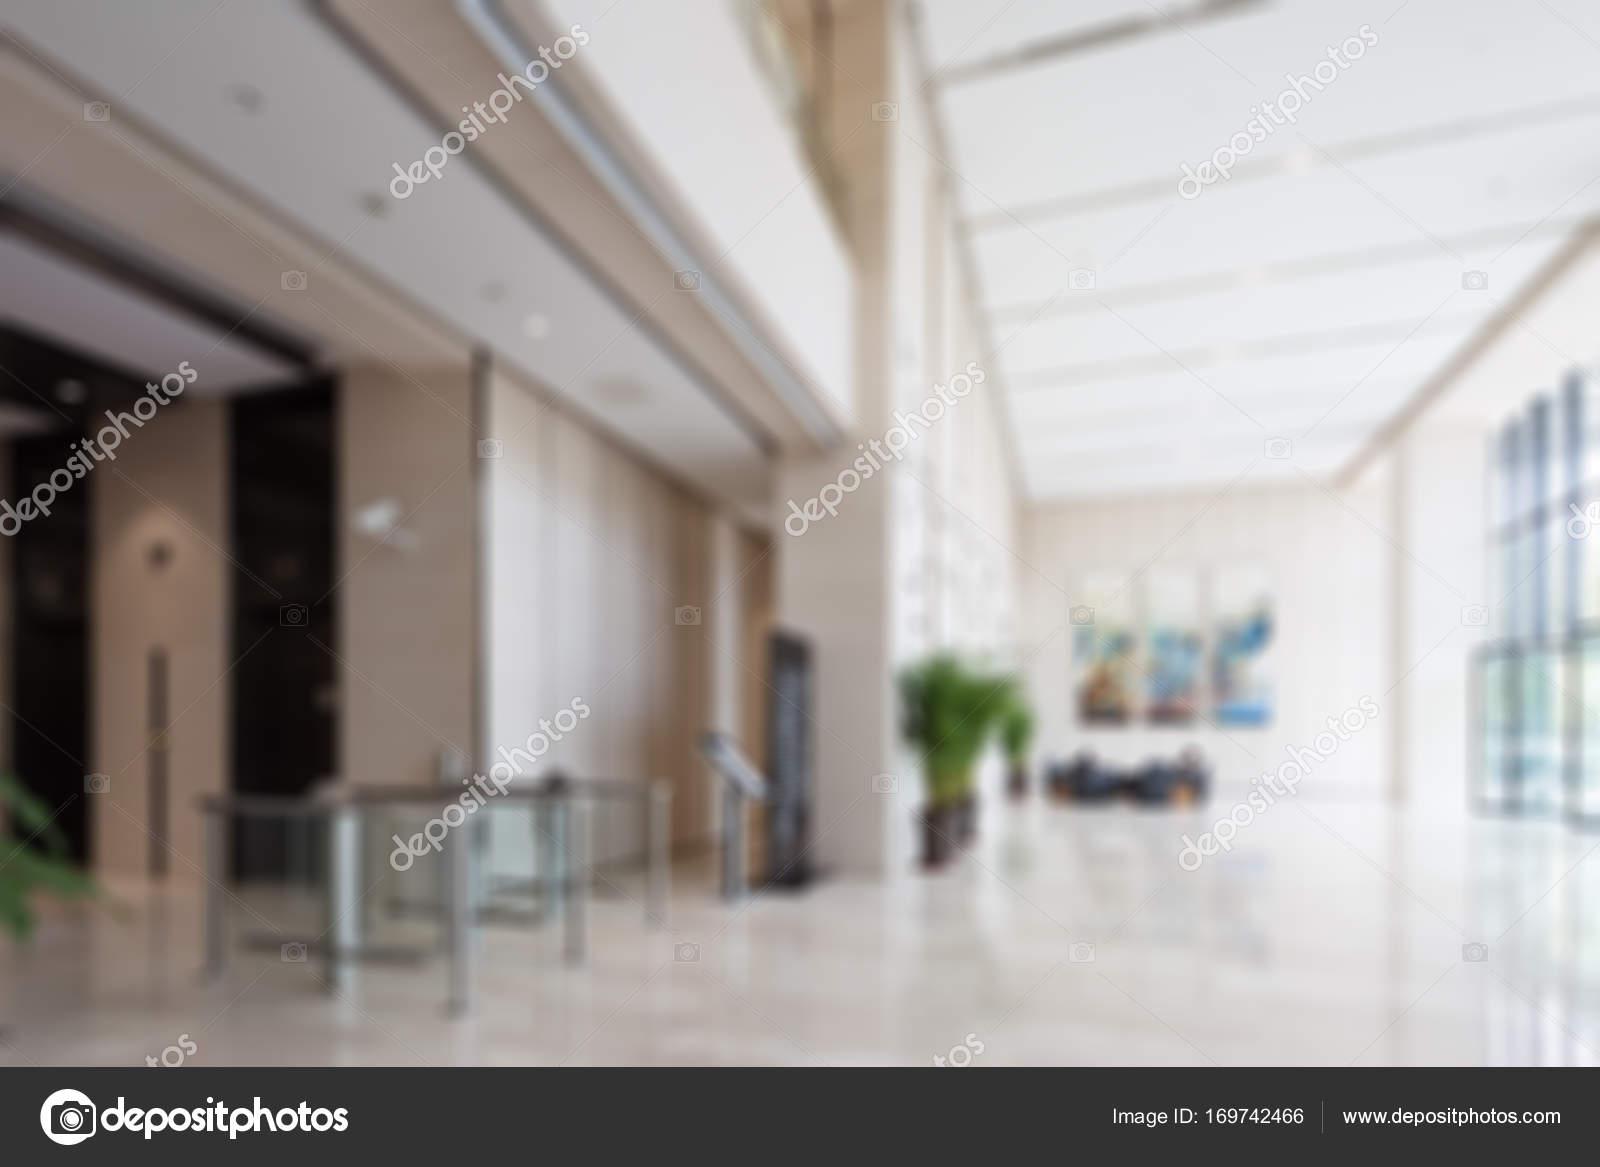 Moderne entree hall interieur u2014 stockfoto © zhudifeng #169742466